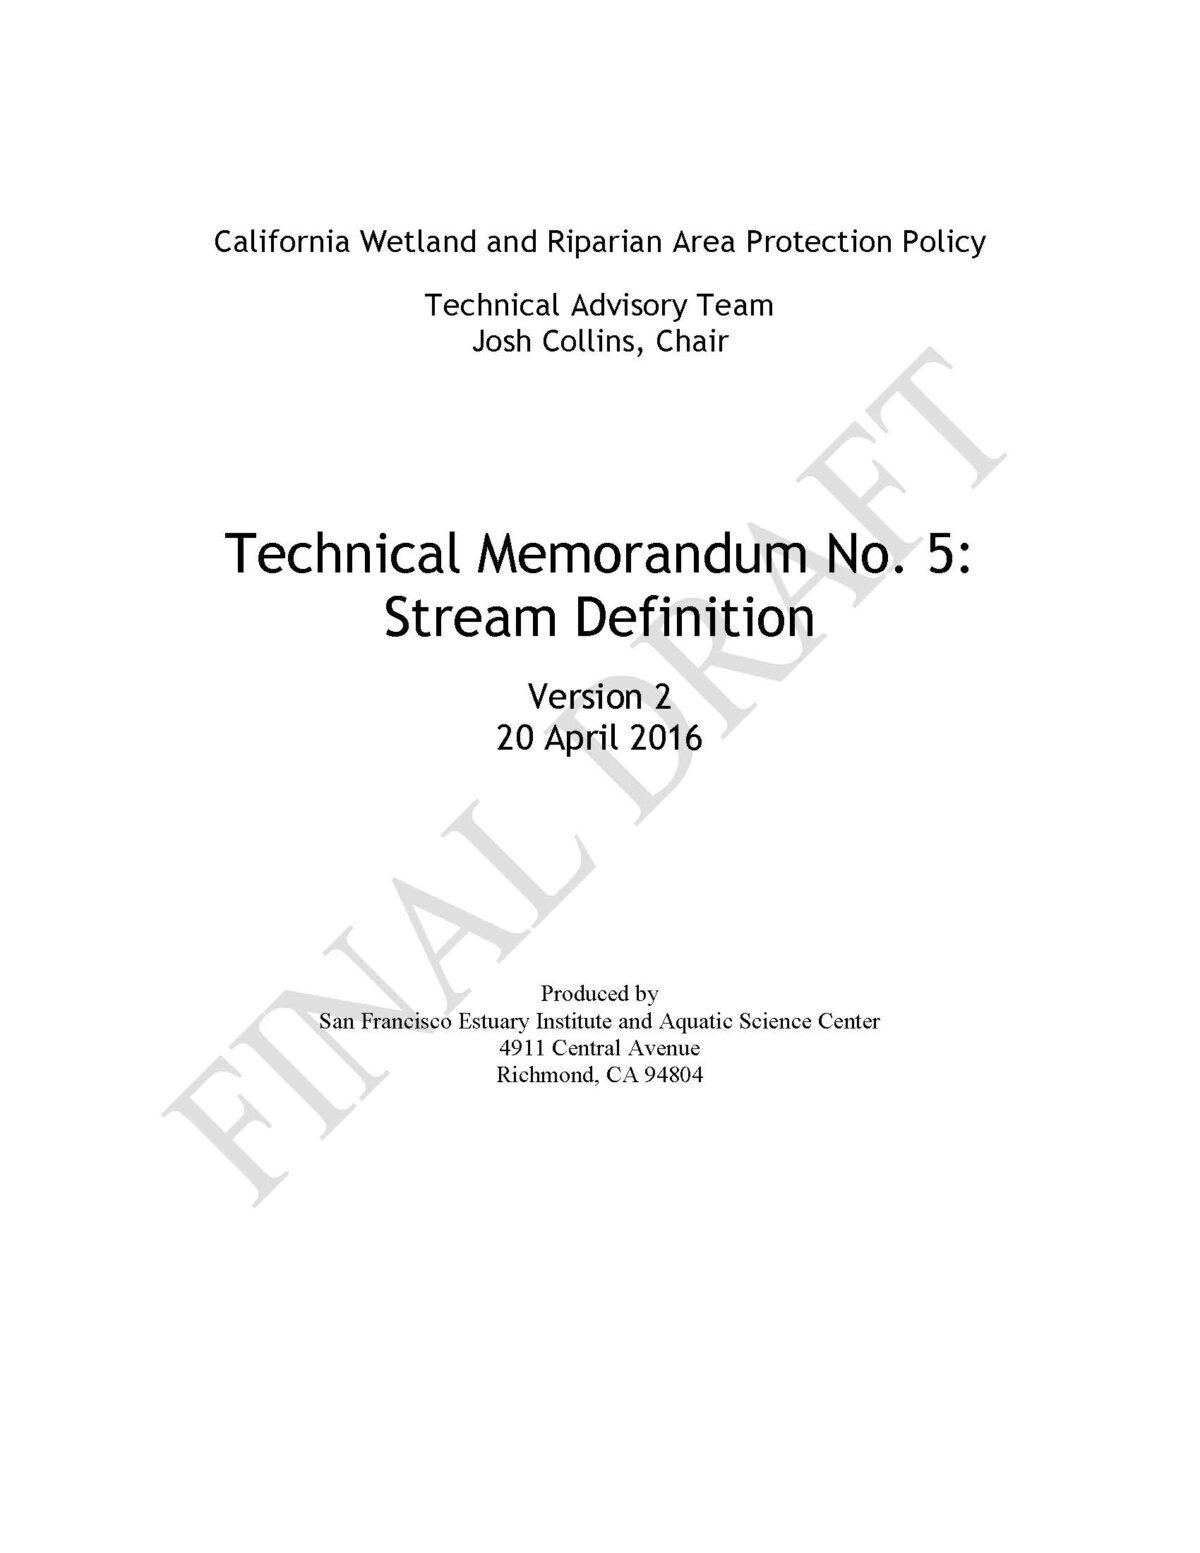 California Wetland and Riparian Area Protection Policy Technical Memorandum No. 5: Stream Definition